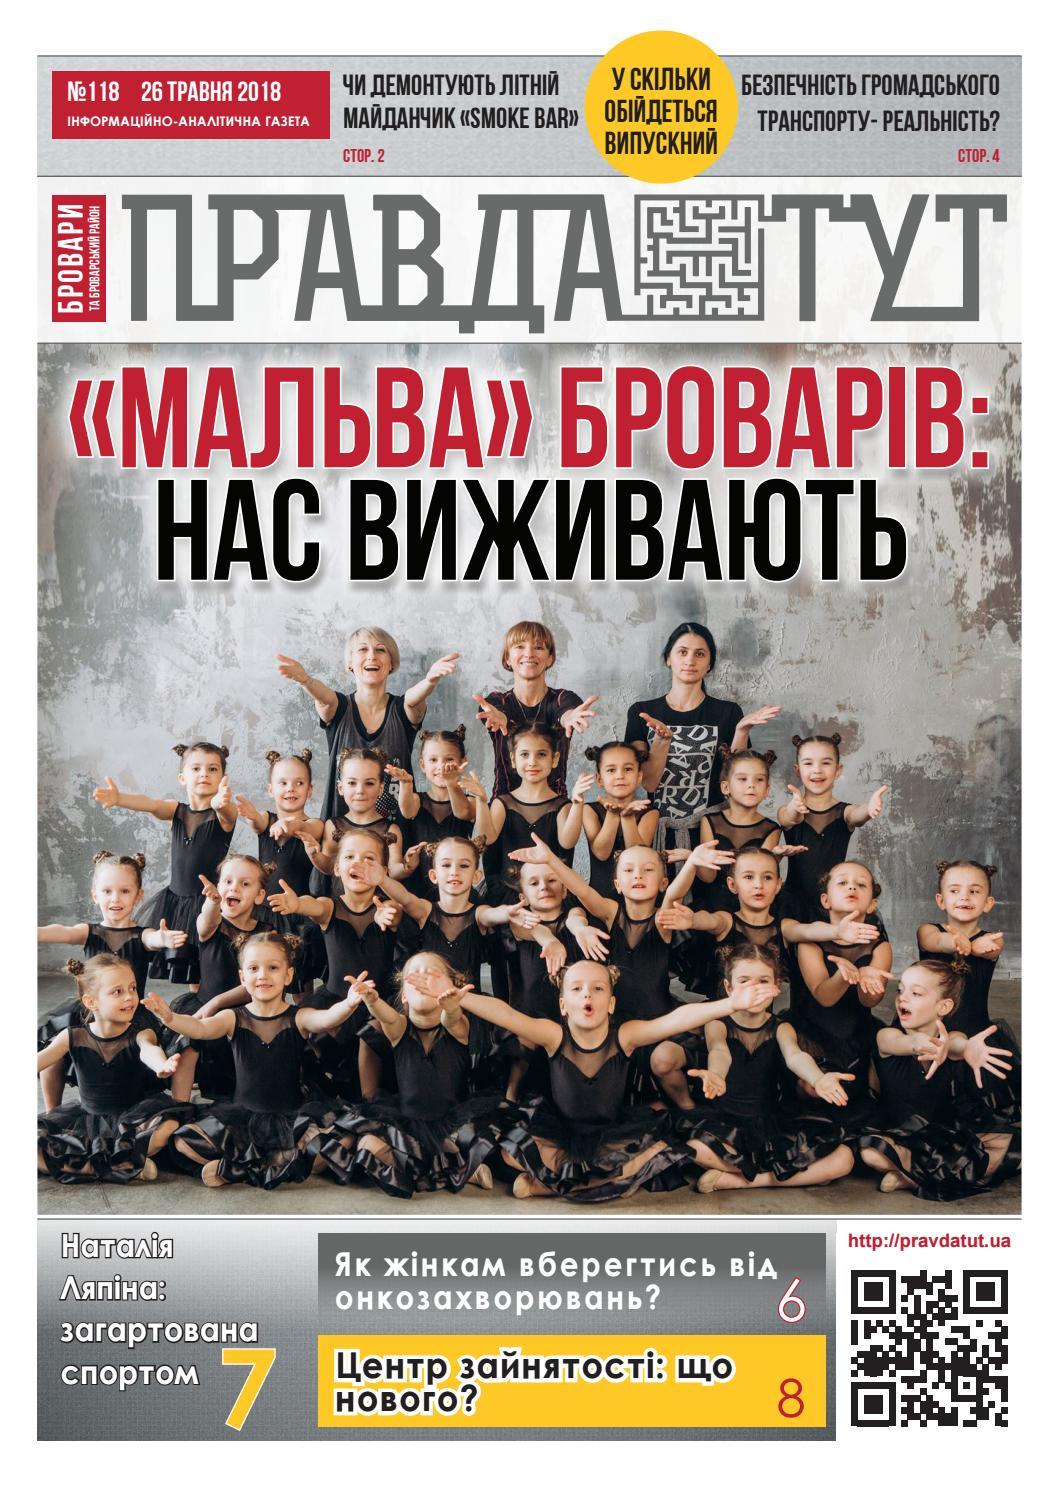 Бровари ПравдаТут випуск 118 by PravdaTut - issuu 843e2a5e9adad